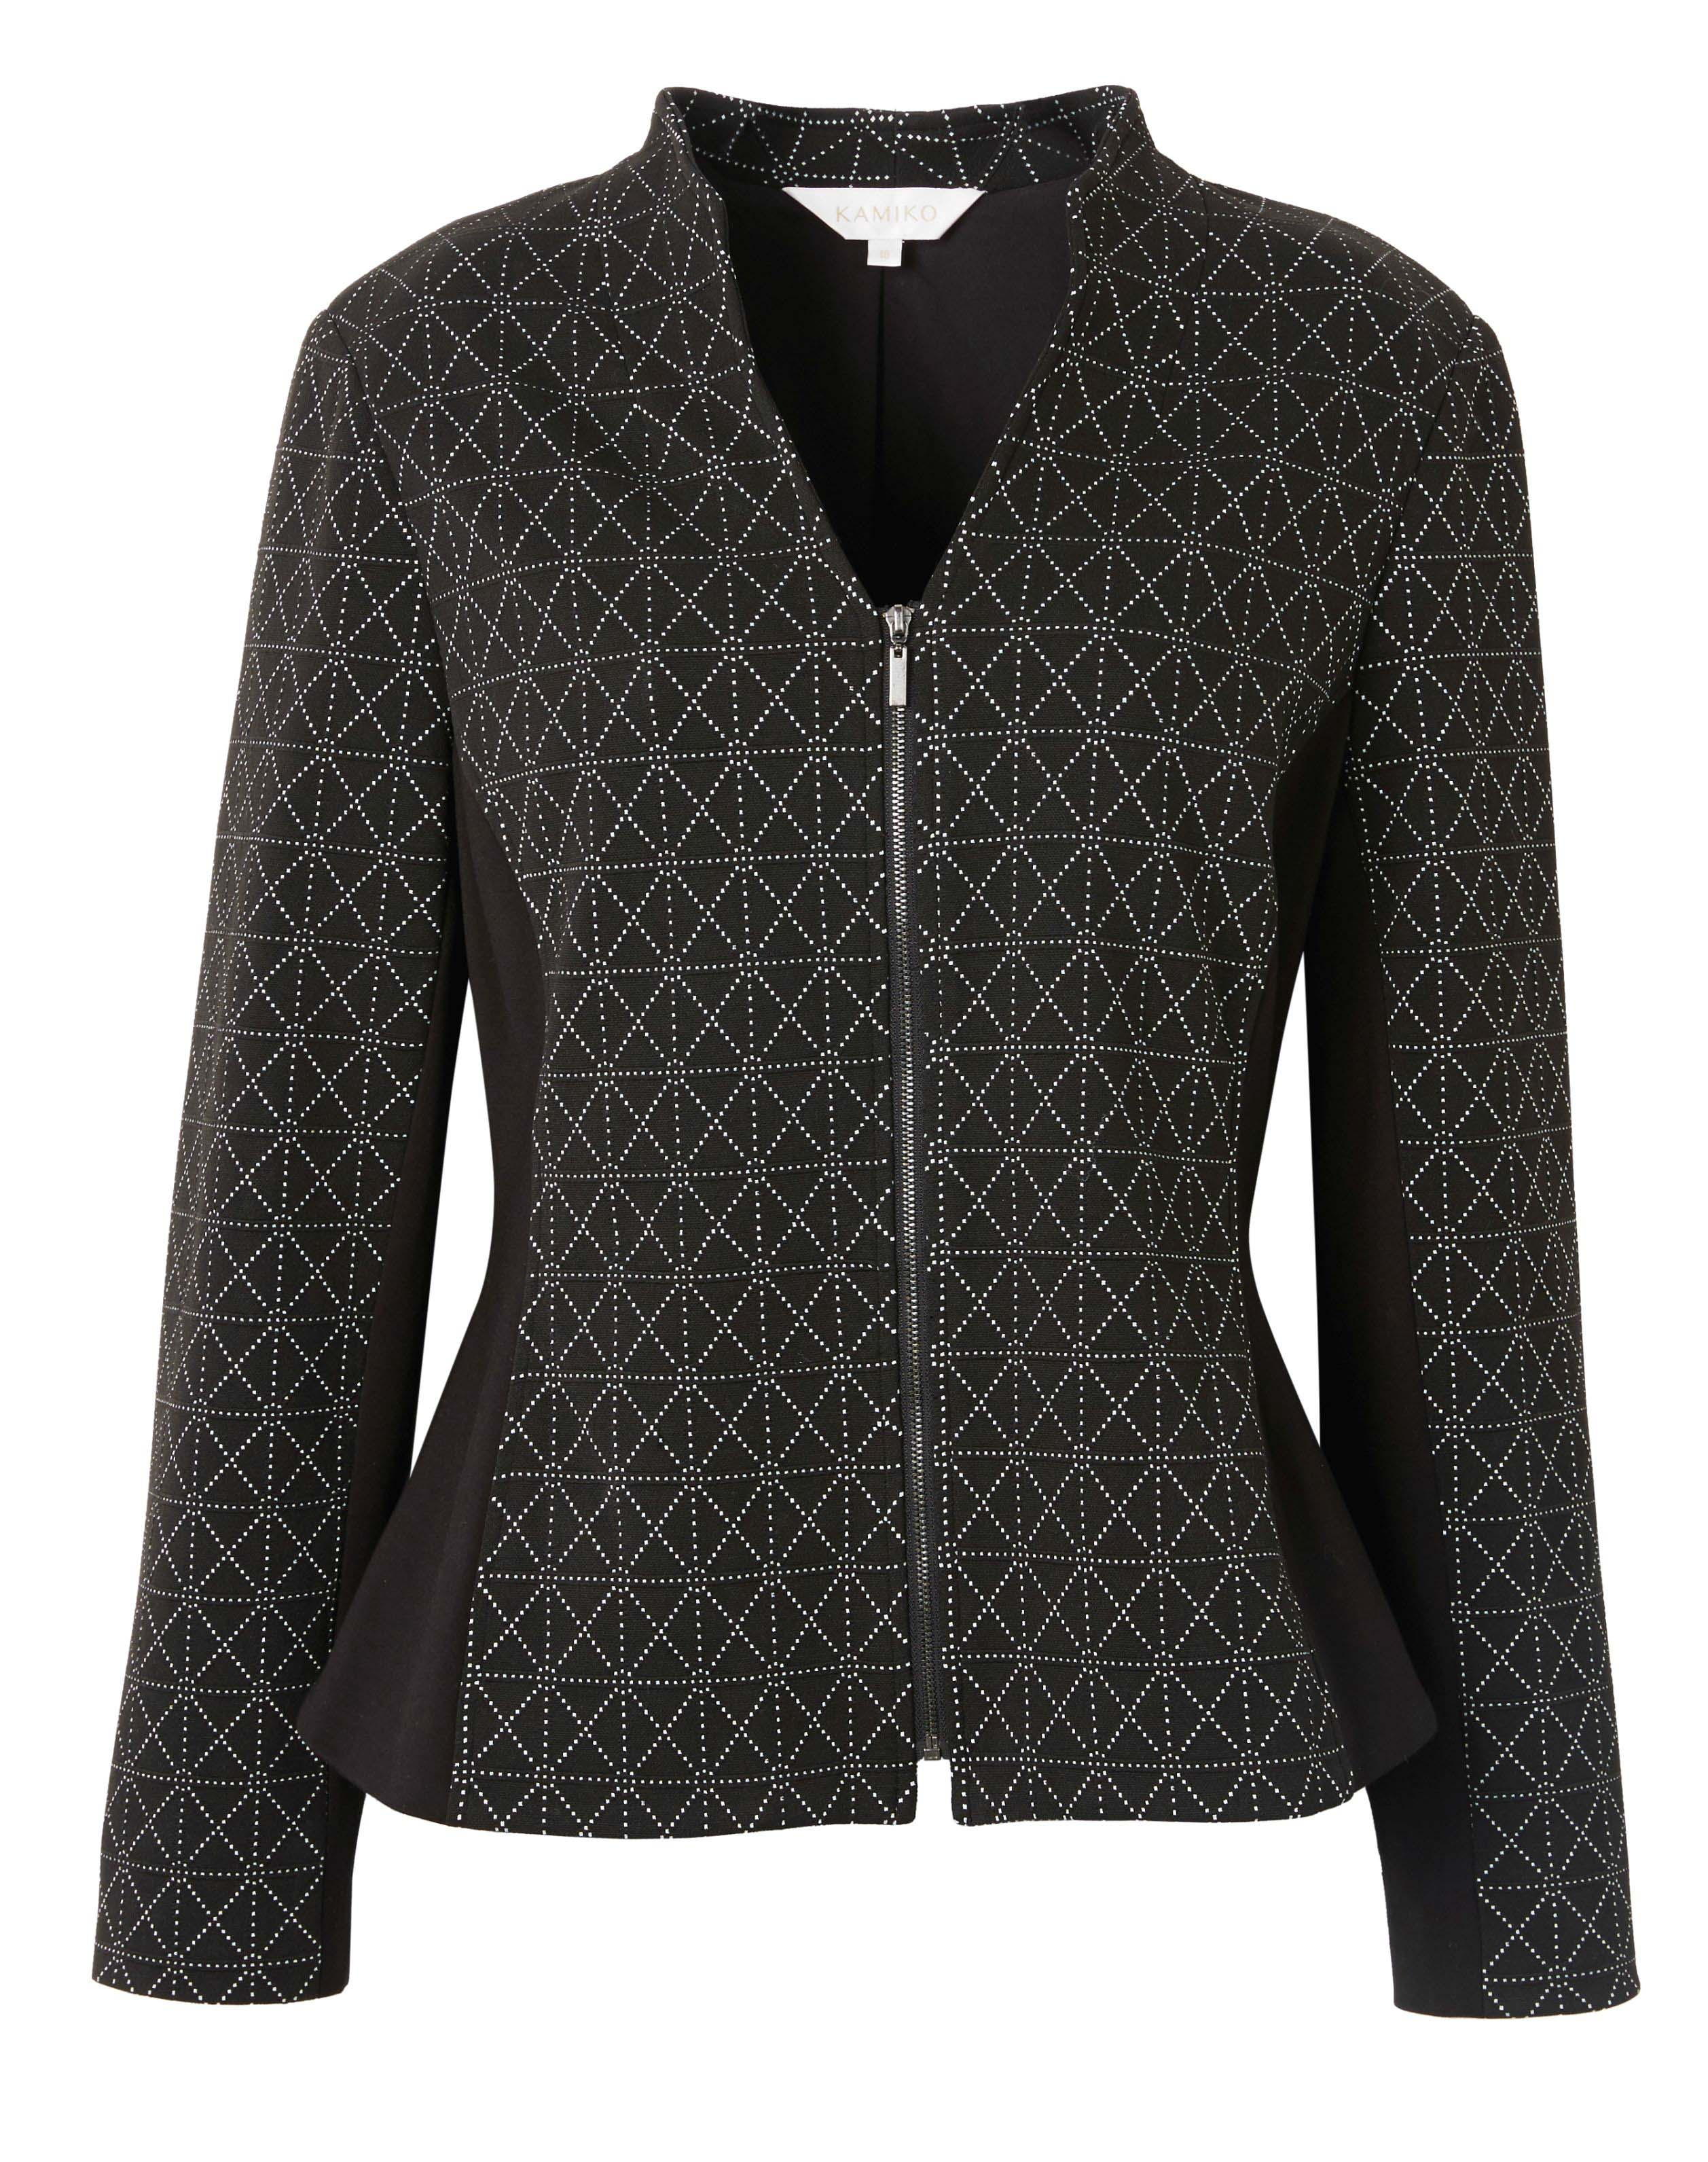 6092610 Kamiko Diamond Print Jacket Black $169.99 Instore 3 Mar 2016